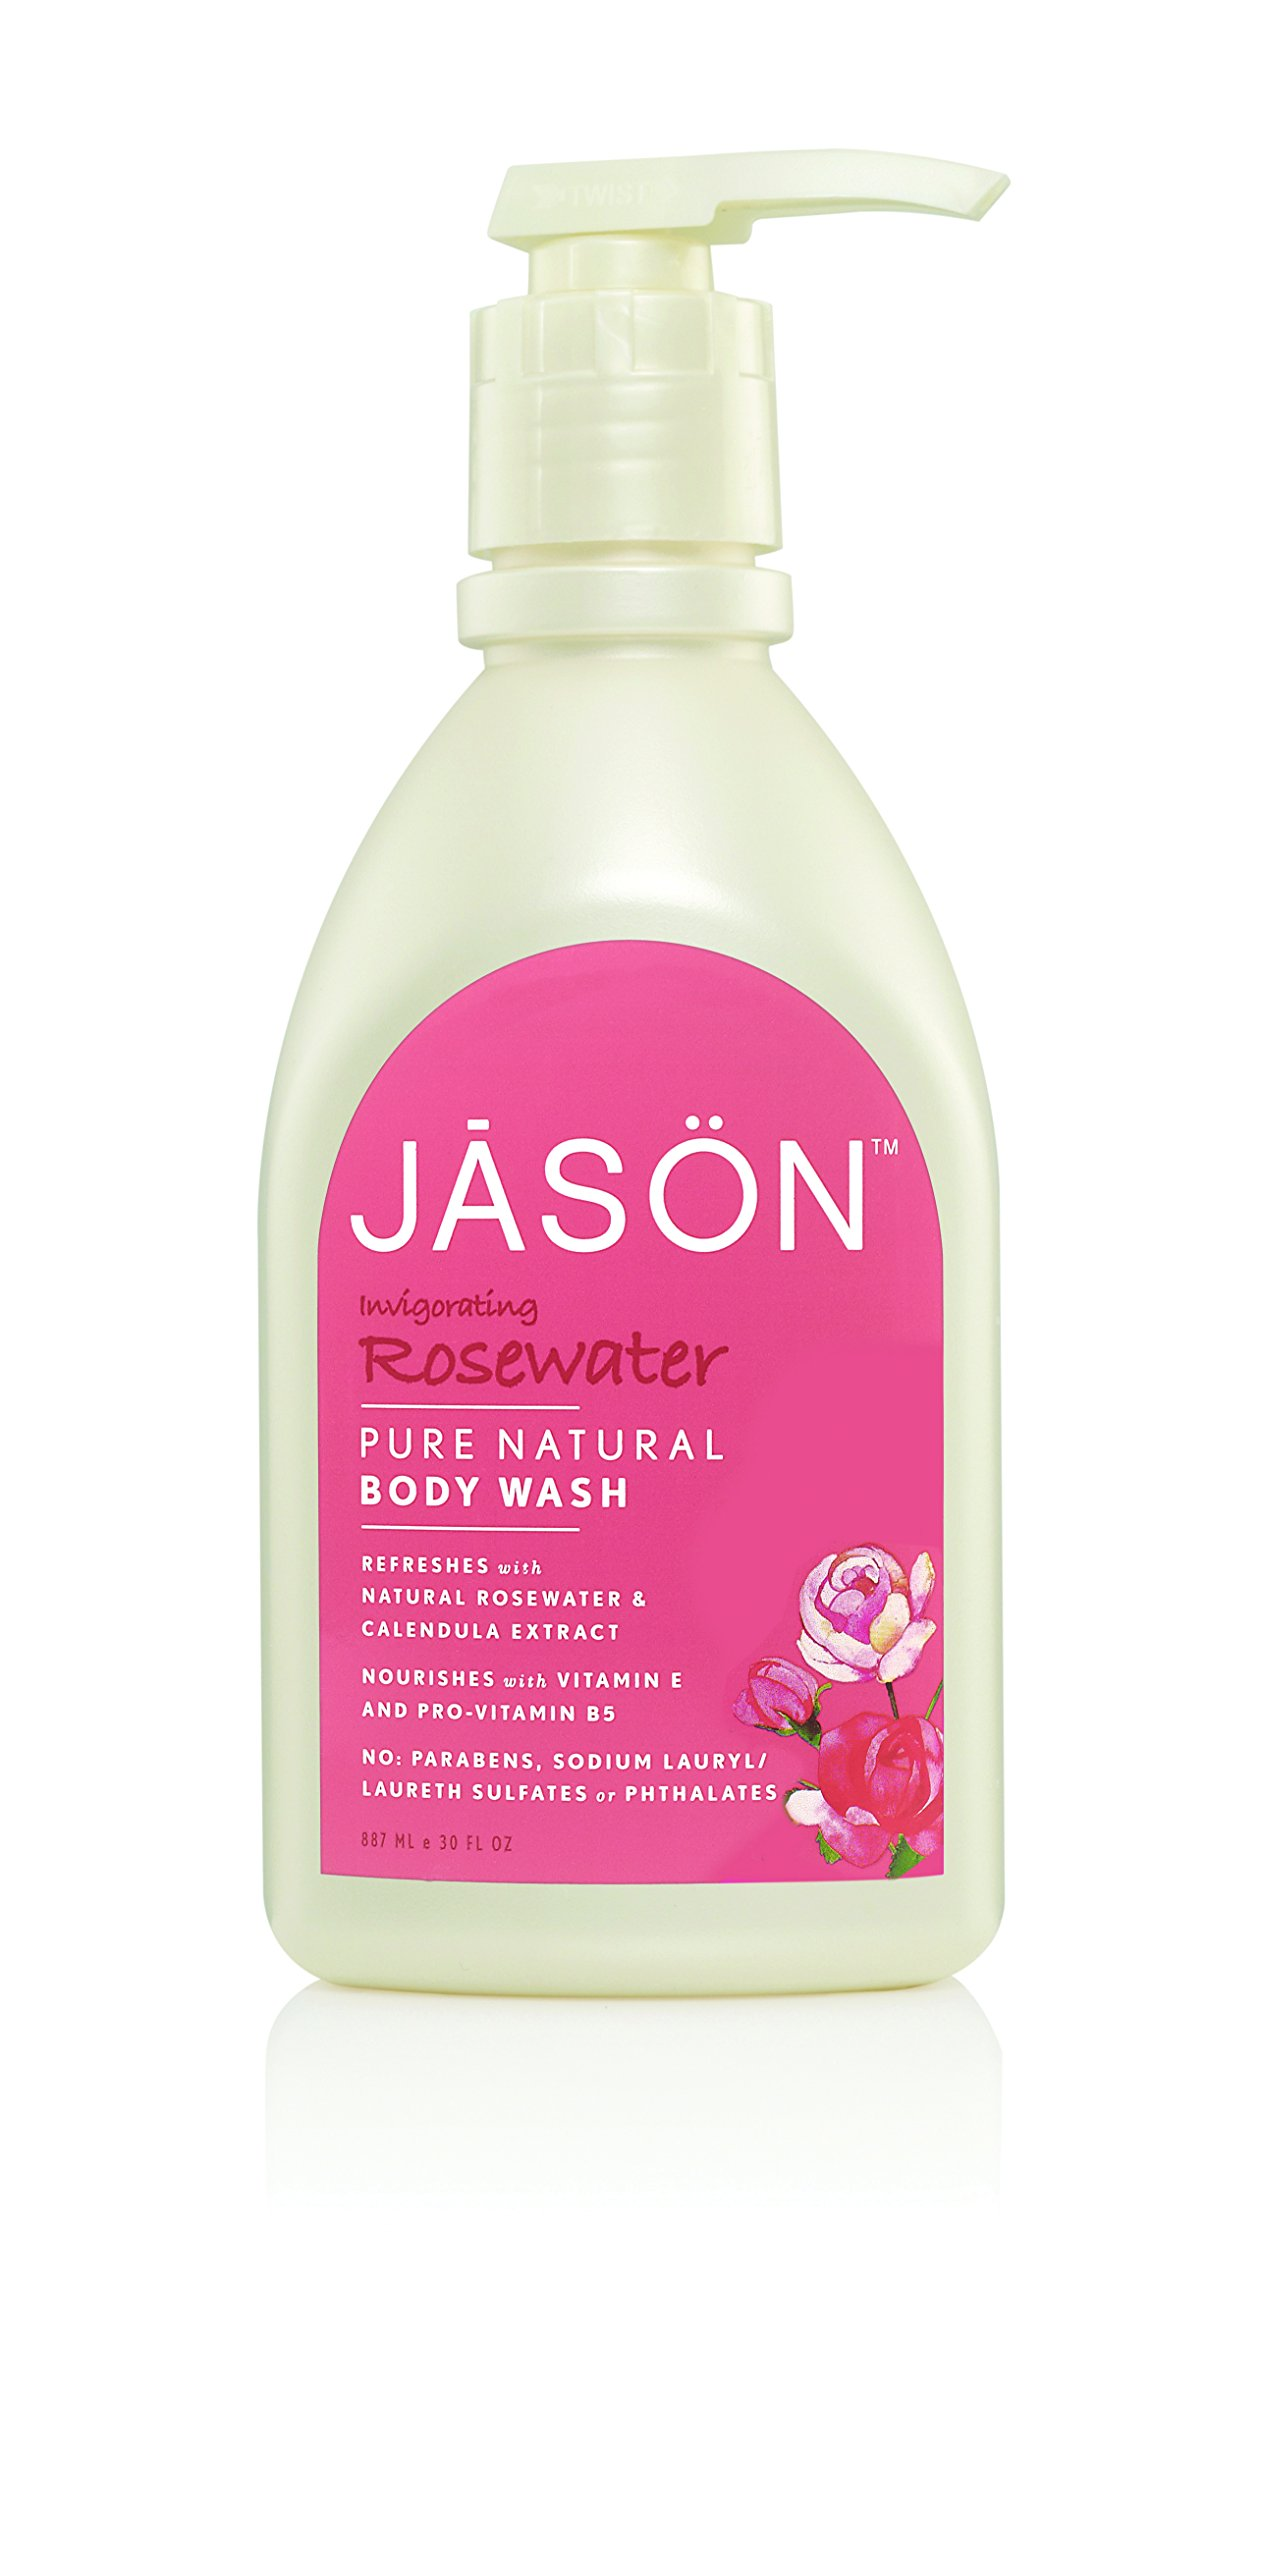 JASON Rosewater Body Wash, 30 Oz (Packaging May Vary)